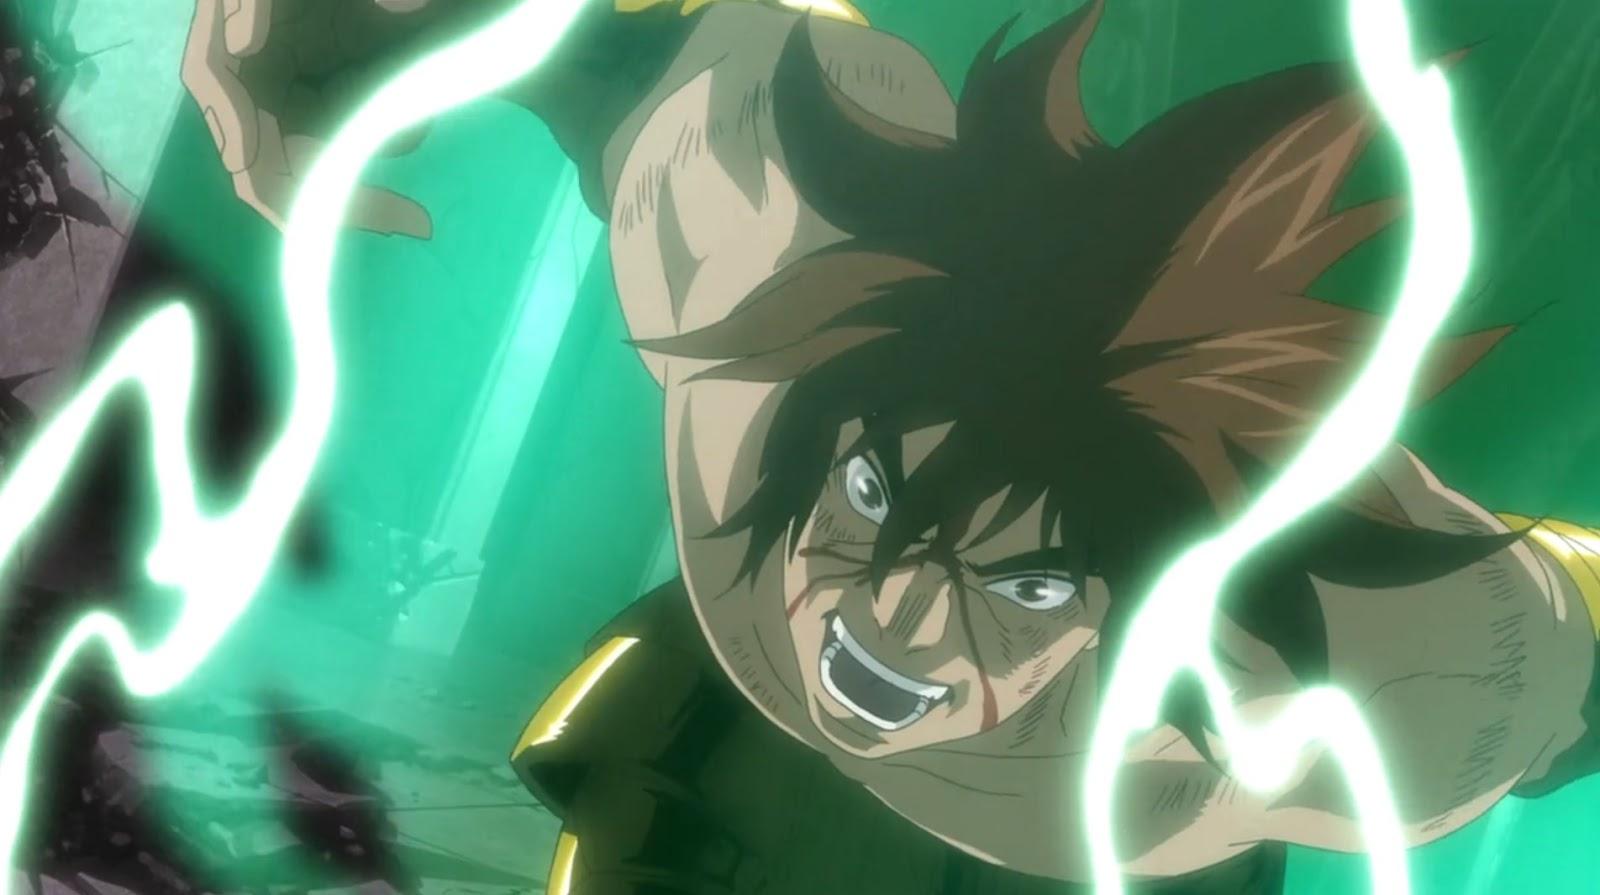 Saint Seiya: The Lost Canvas Episodio 26 Dublado Final